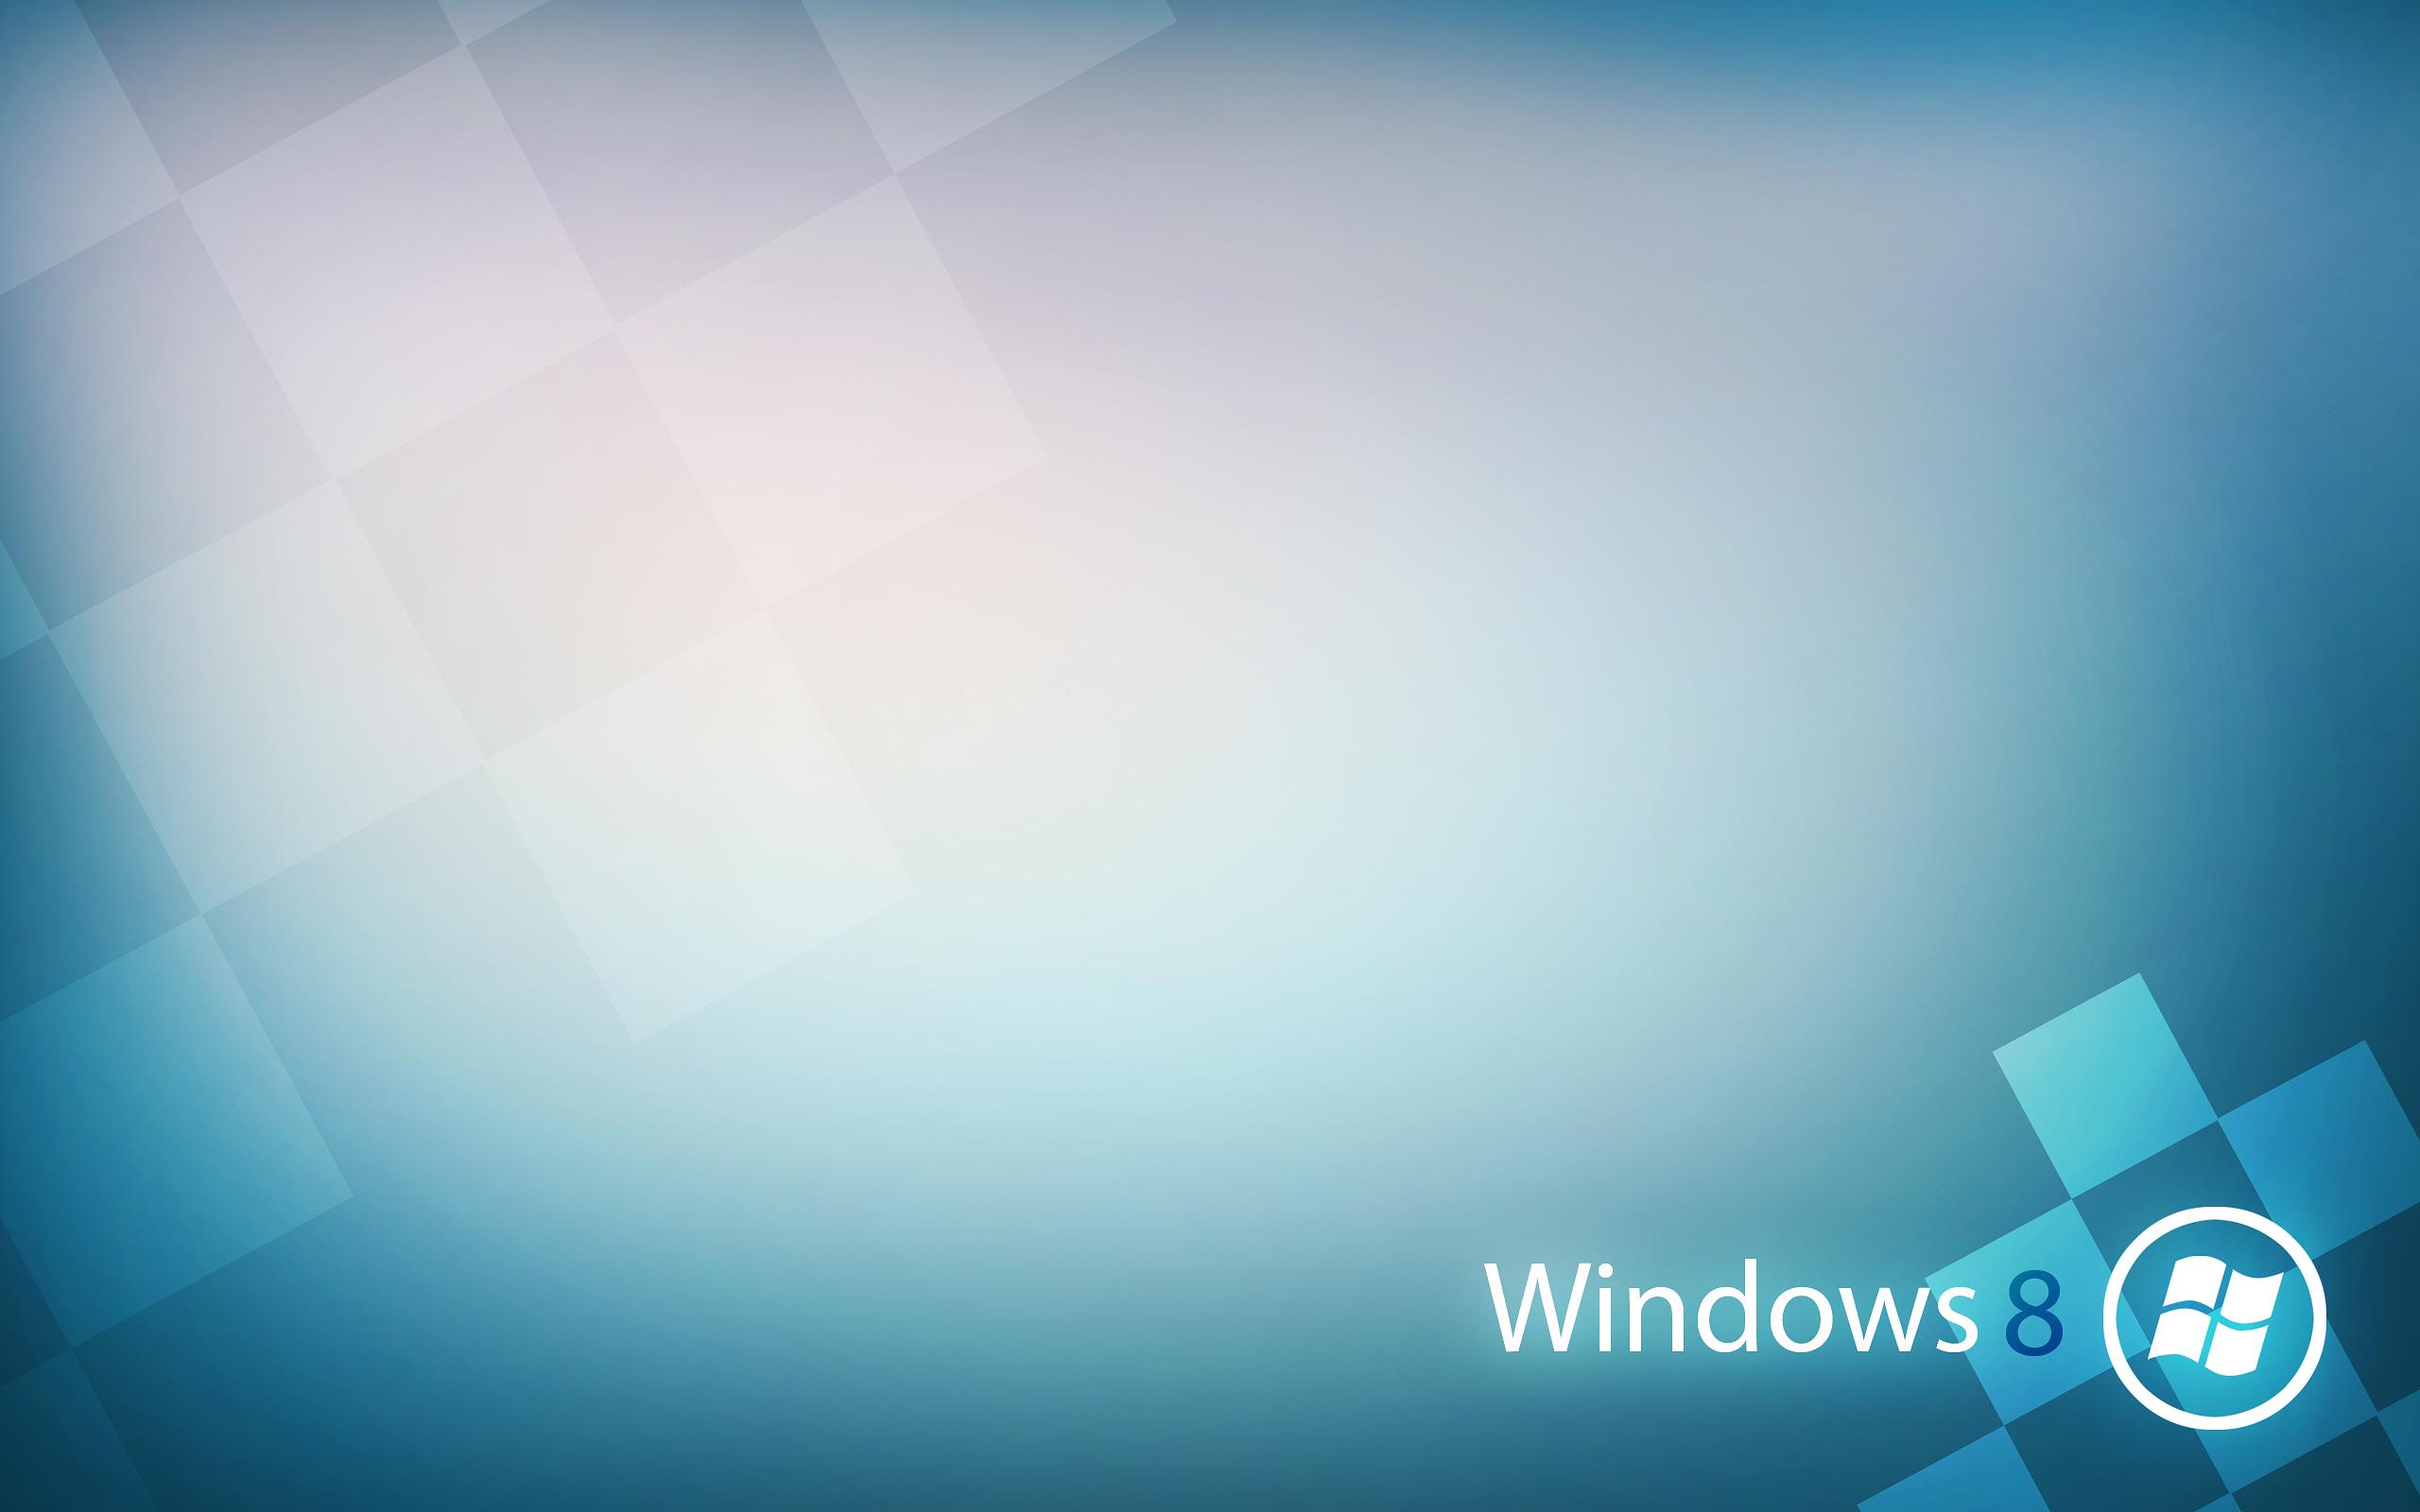 Wallpaper 4k Windows 8 Metro Linkin Windows